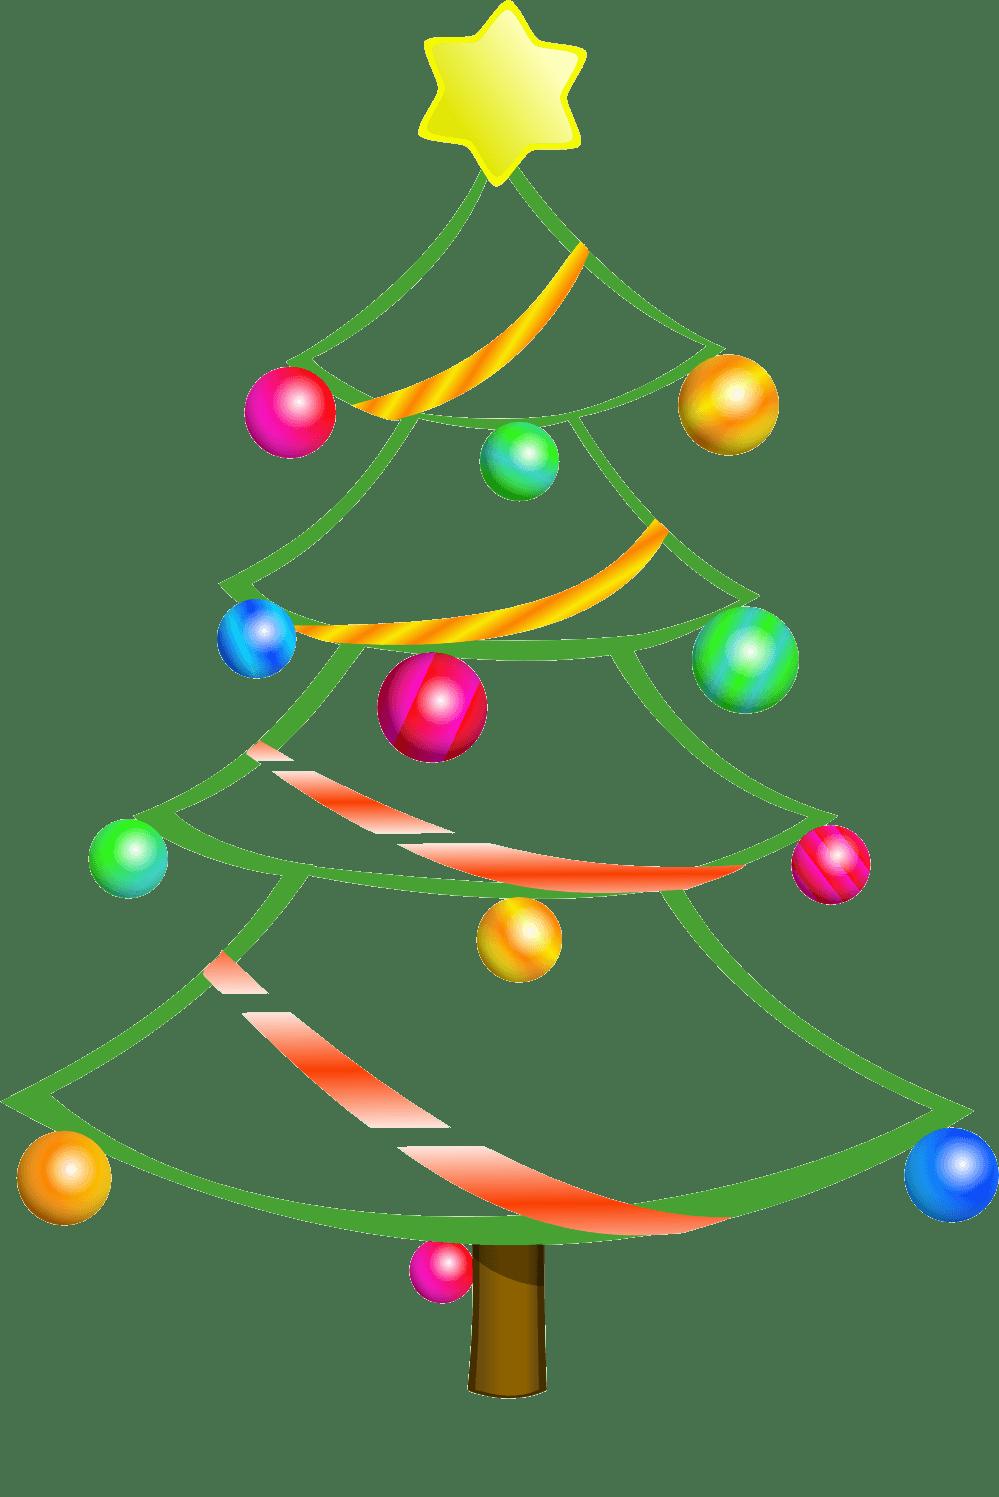 medium resolution of twelve days of christmas free at getdrawings tobi naruto pictures drawings nativity clipart akatsuki